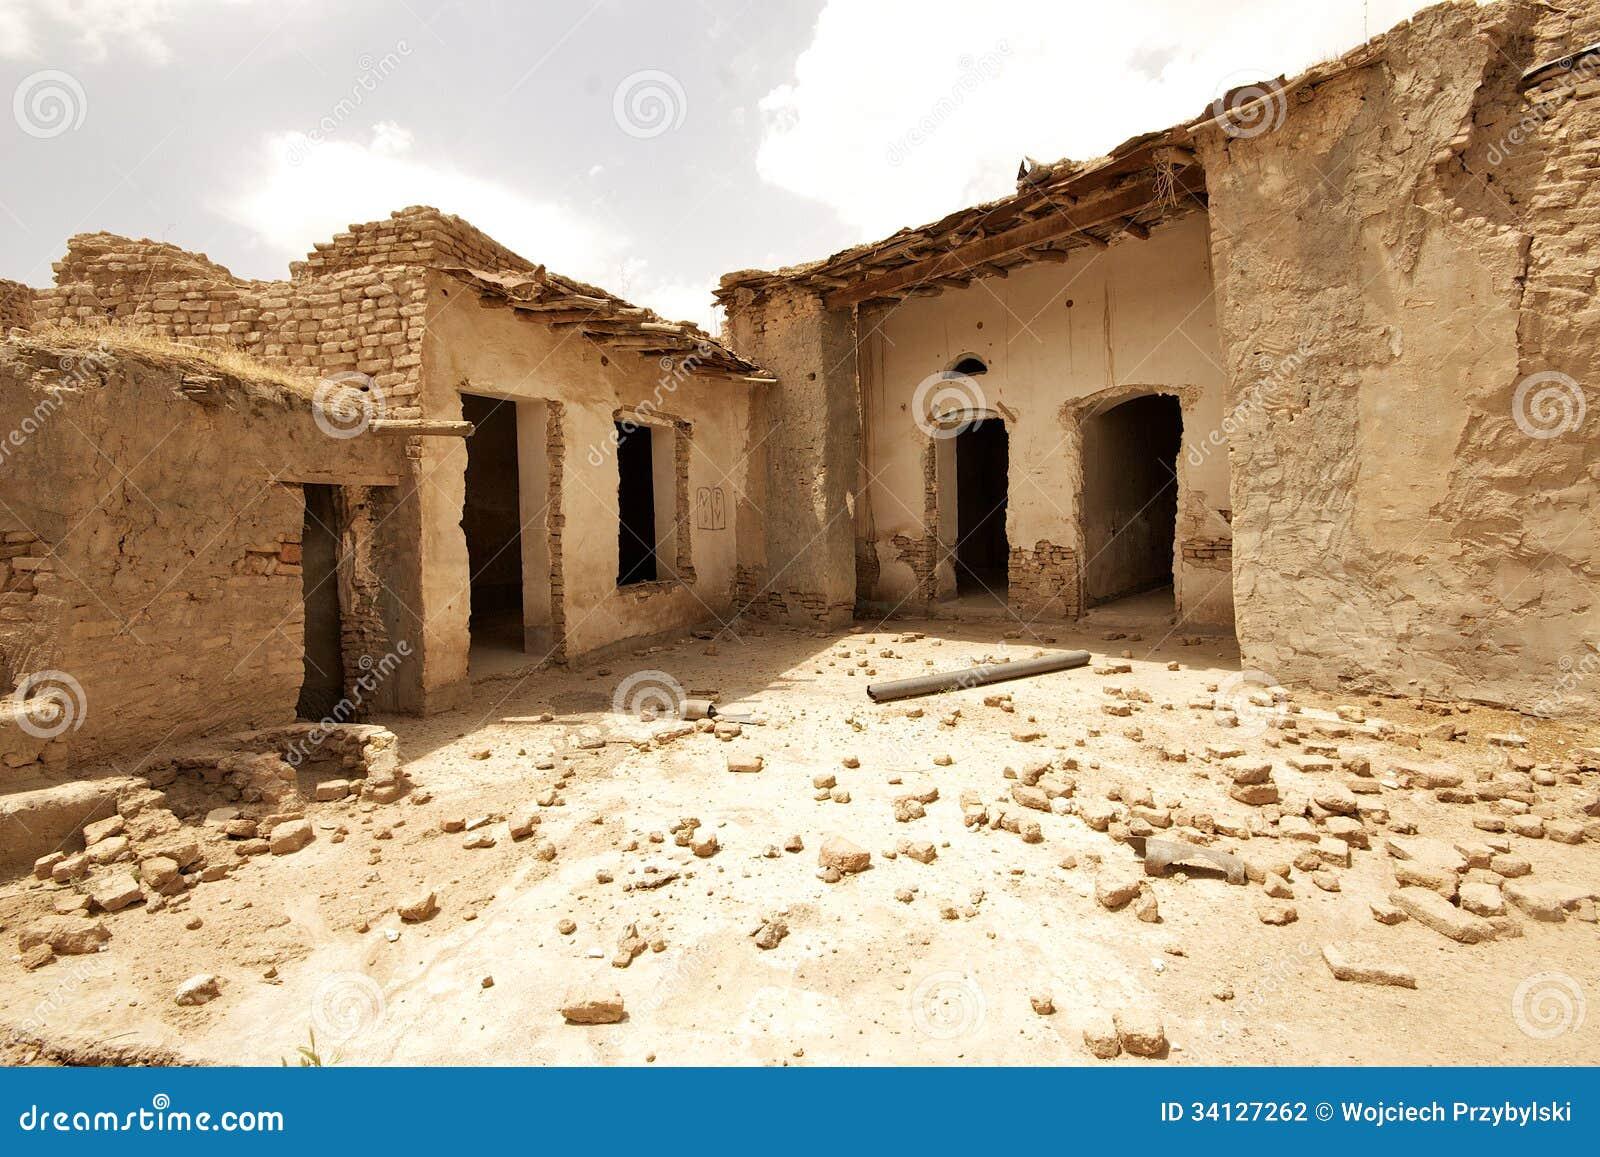 Stone And Clay House In Arbil Citadel, Kurdistan, Iraq